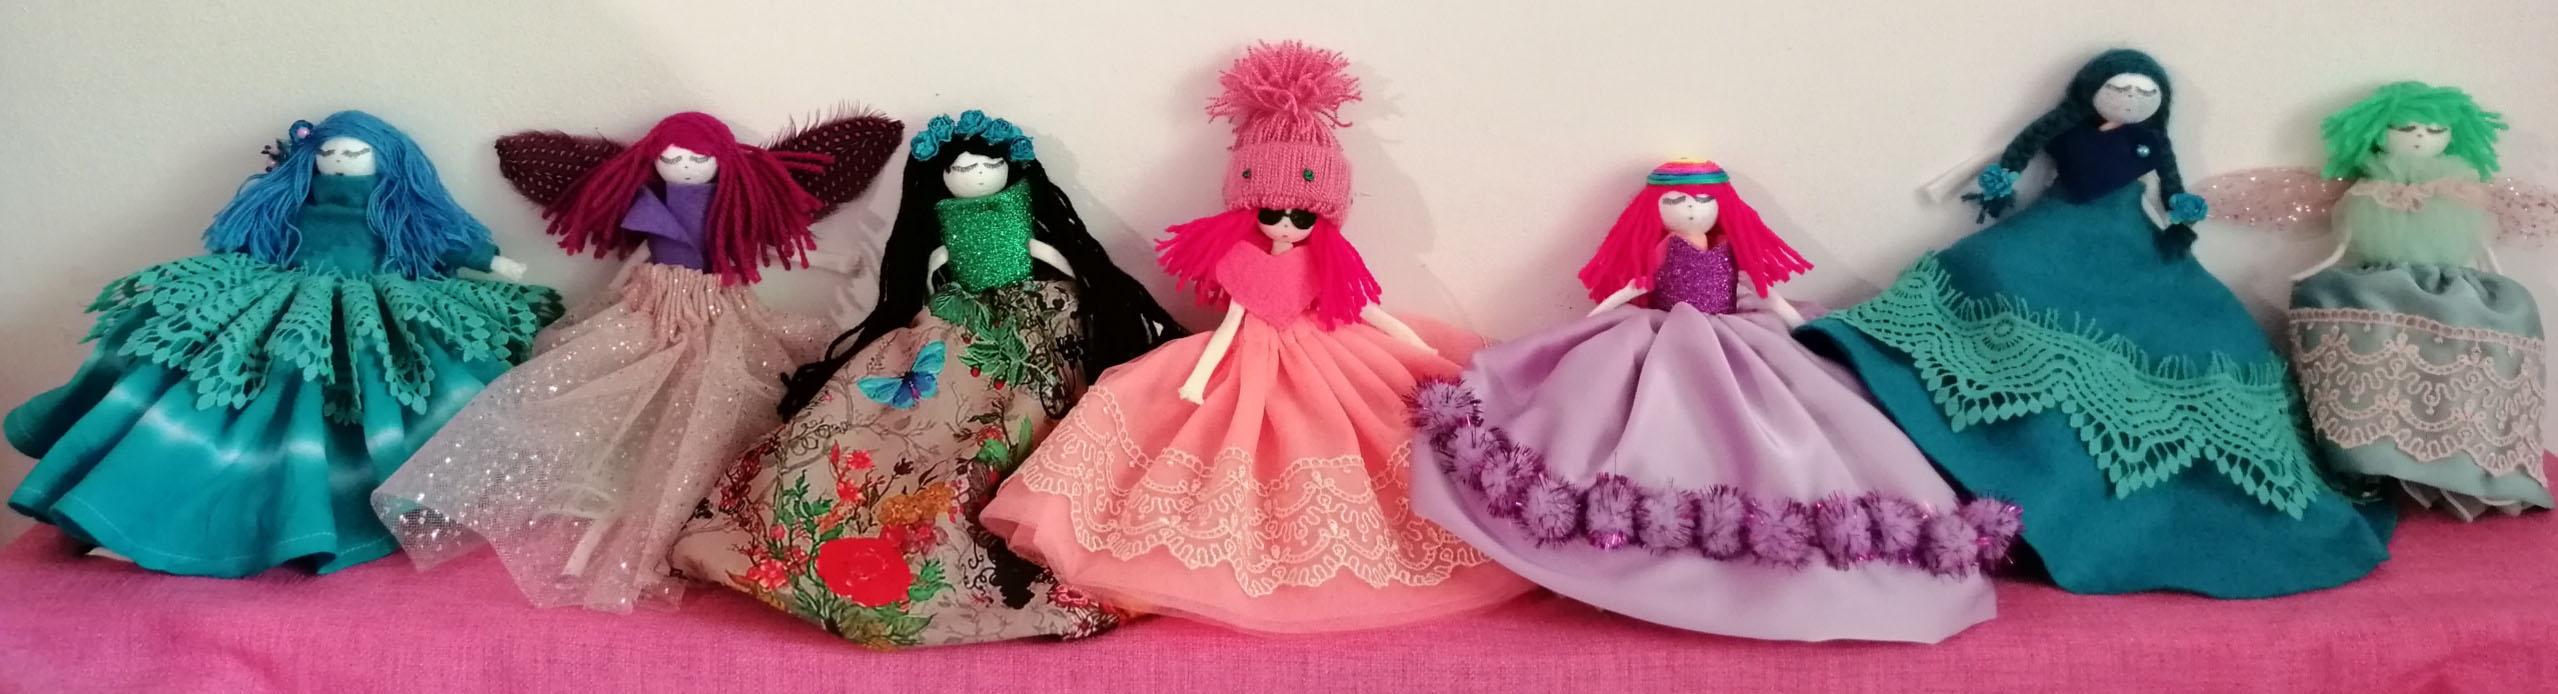 7-papusi-handmade-dolls-lucrate-manual-colectie